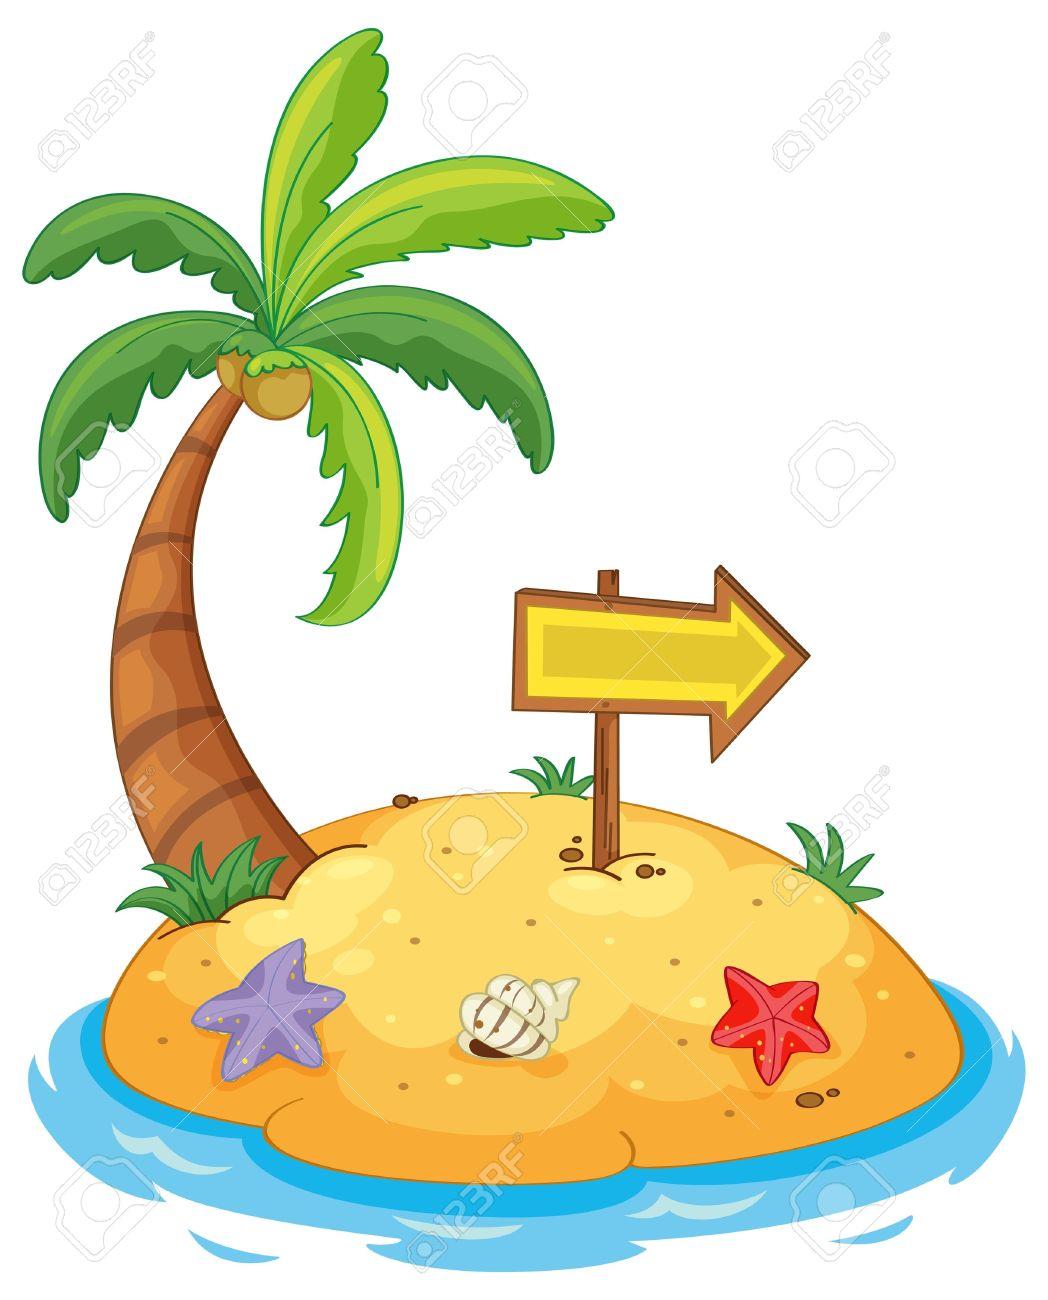 Cartoon tropical island clipart - Clipar-Cartoon tropical island clipart - ClipartFest-14